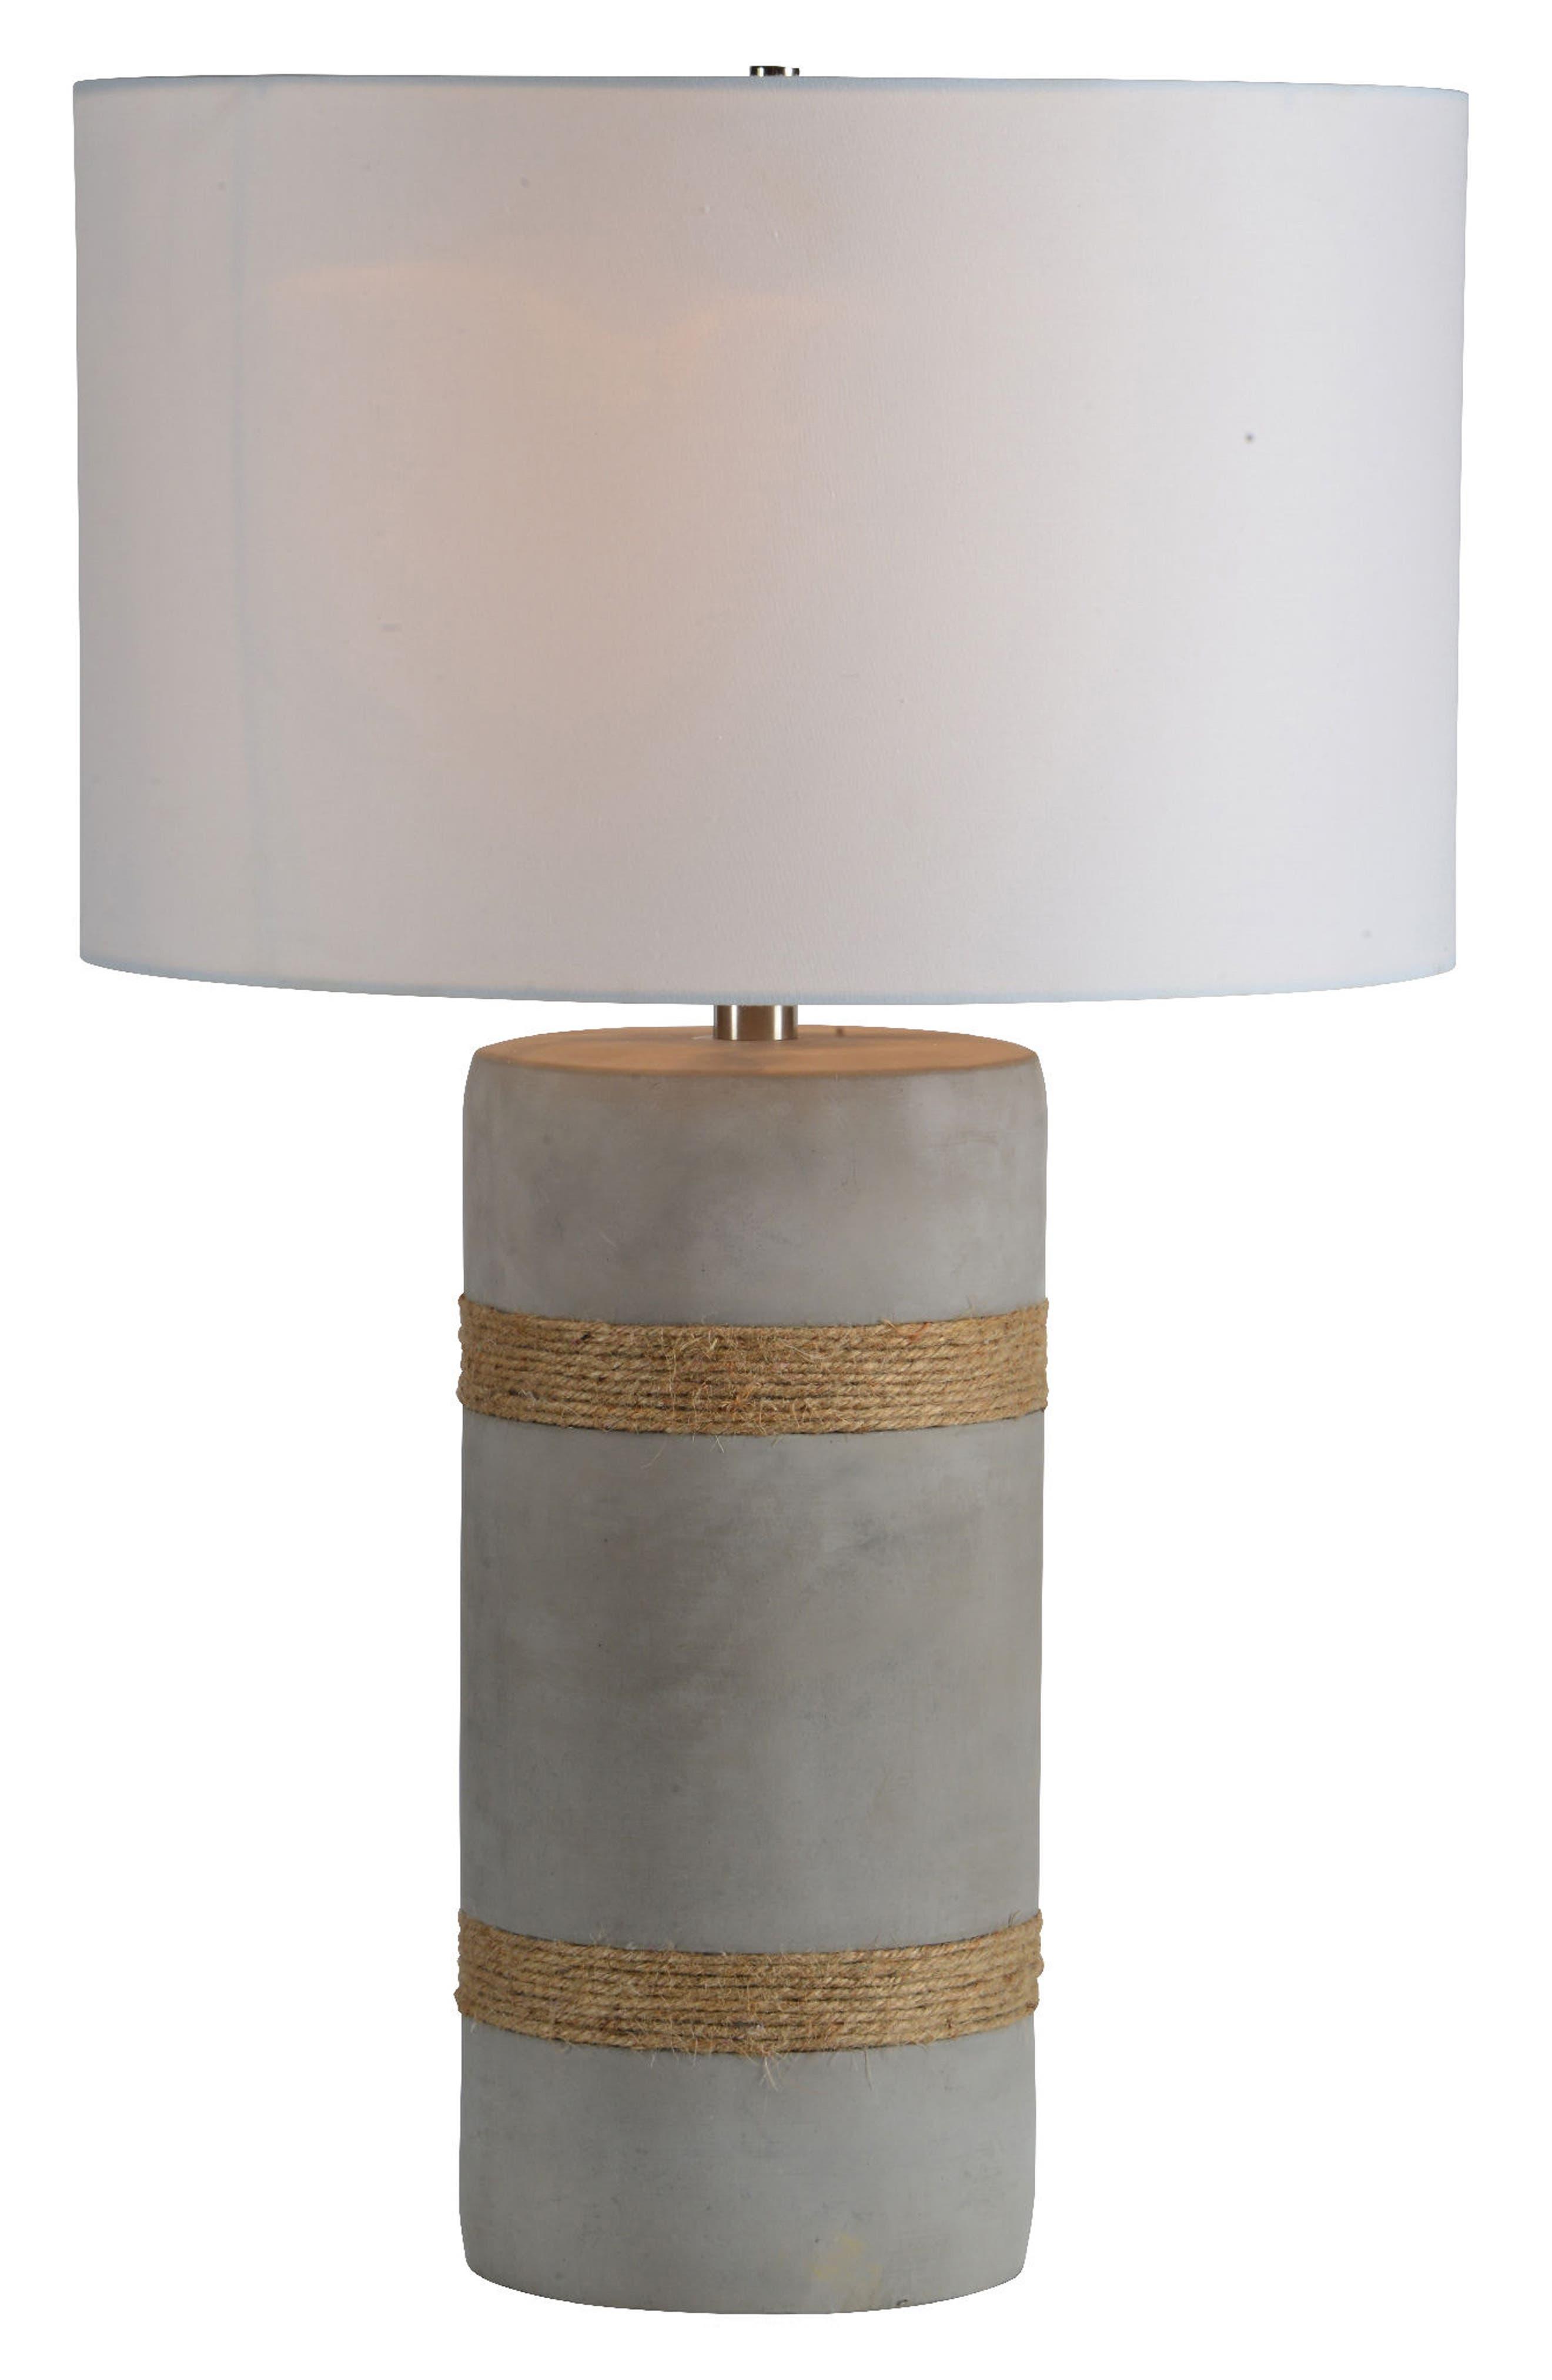 Alternate Image 1 Selected - Renwil Malden Table Lamp